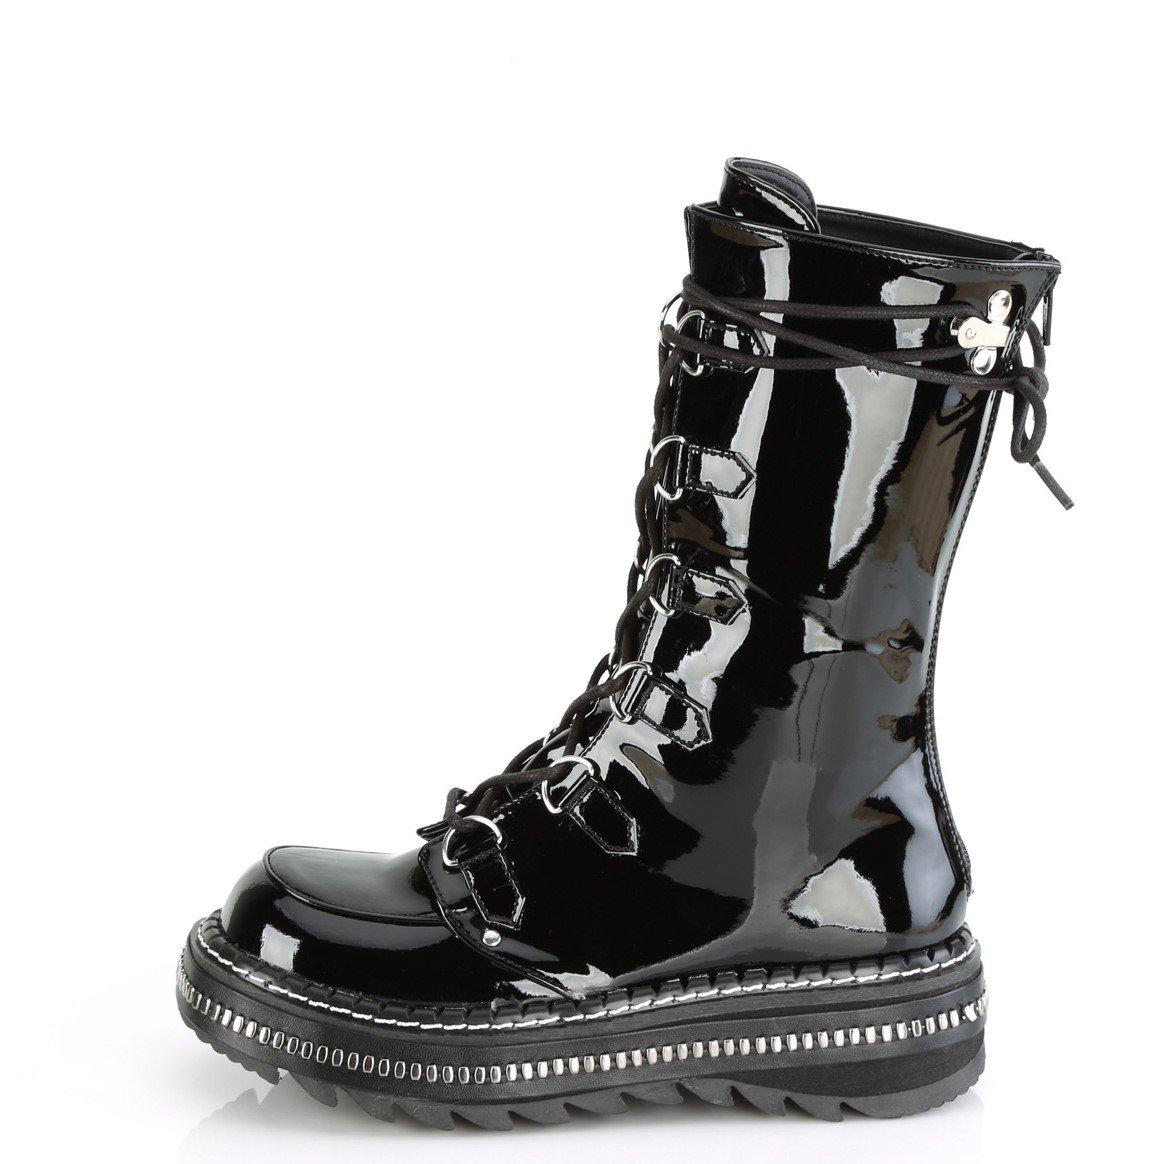 Lilith-270 Shiny Black Vegan Leather Zip /& Lace Platform Boots Gothic,Goth